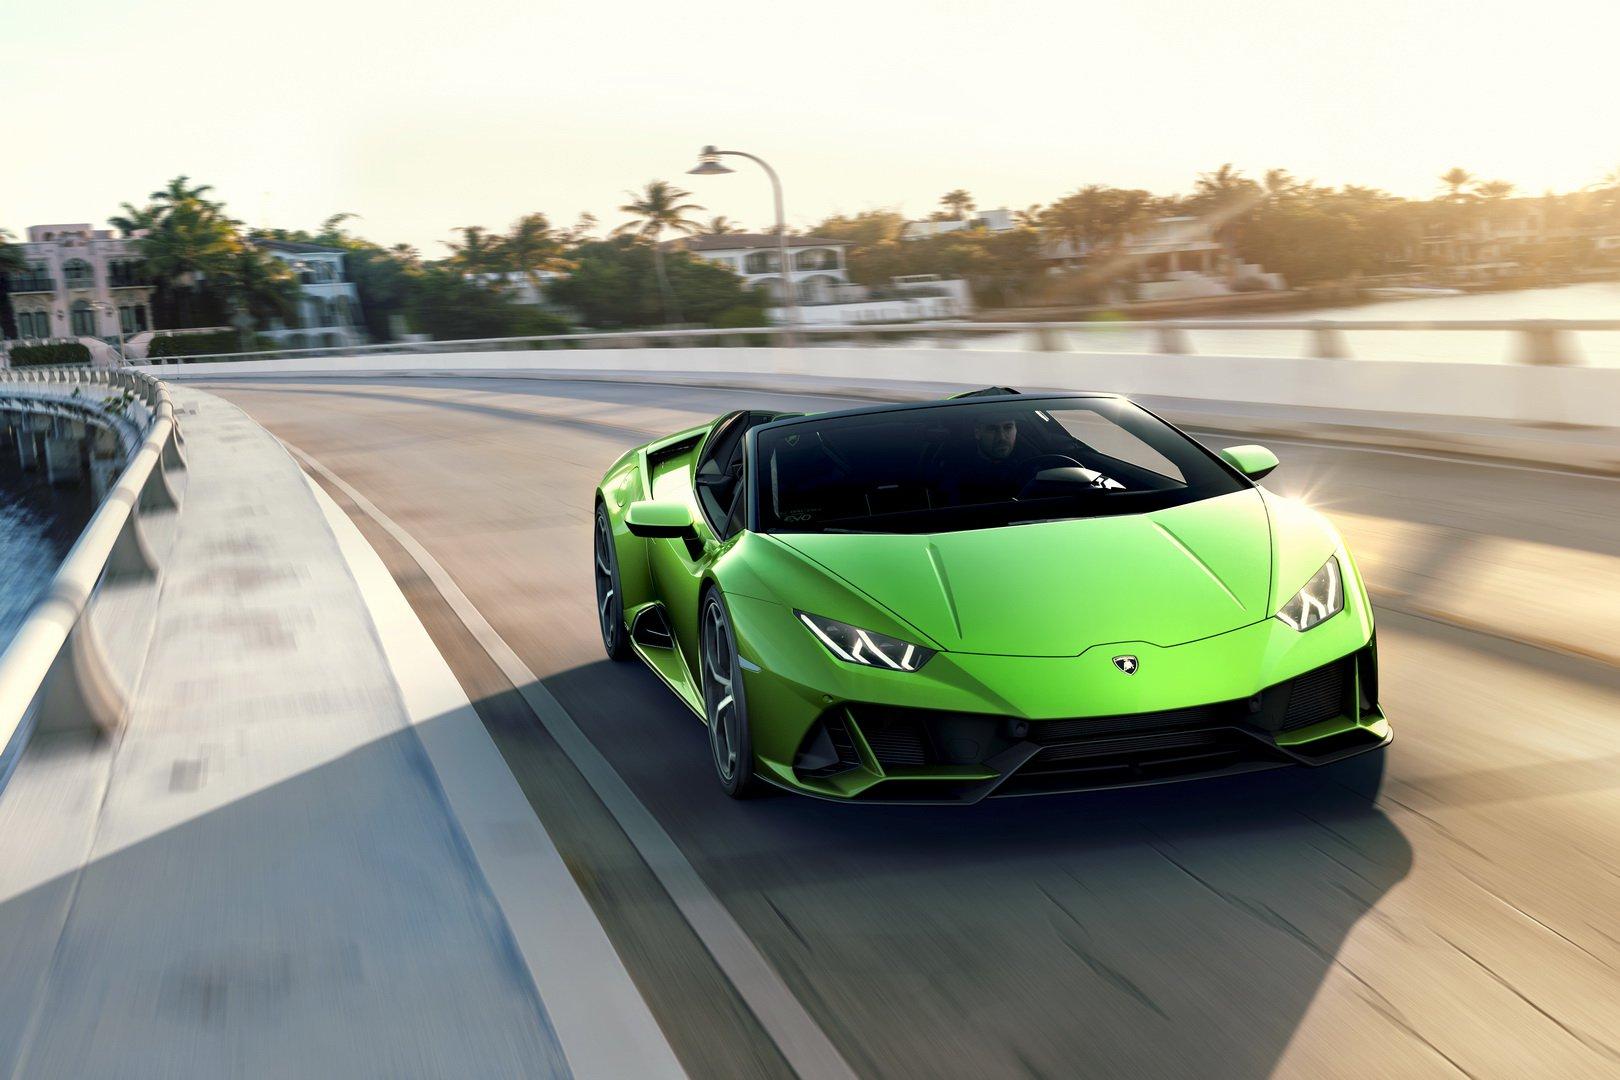 Noul Lamborghini Huracan Evo Spyder (7)